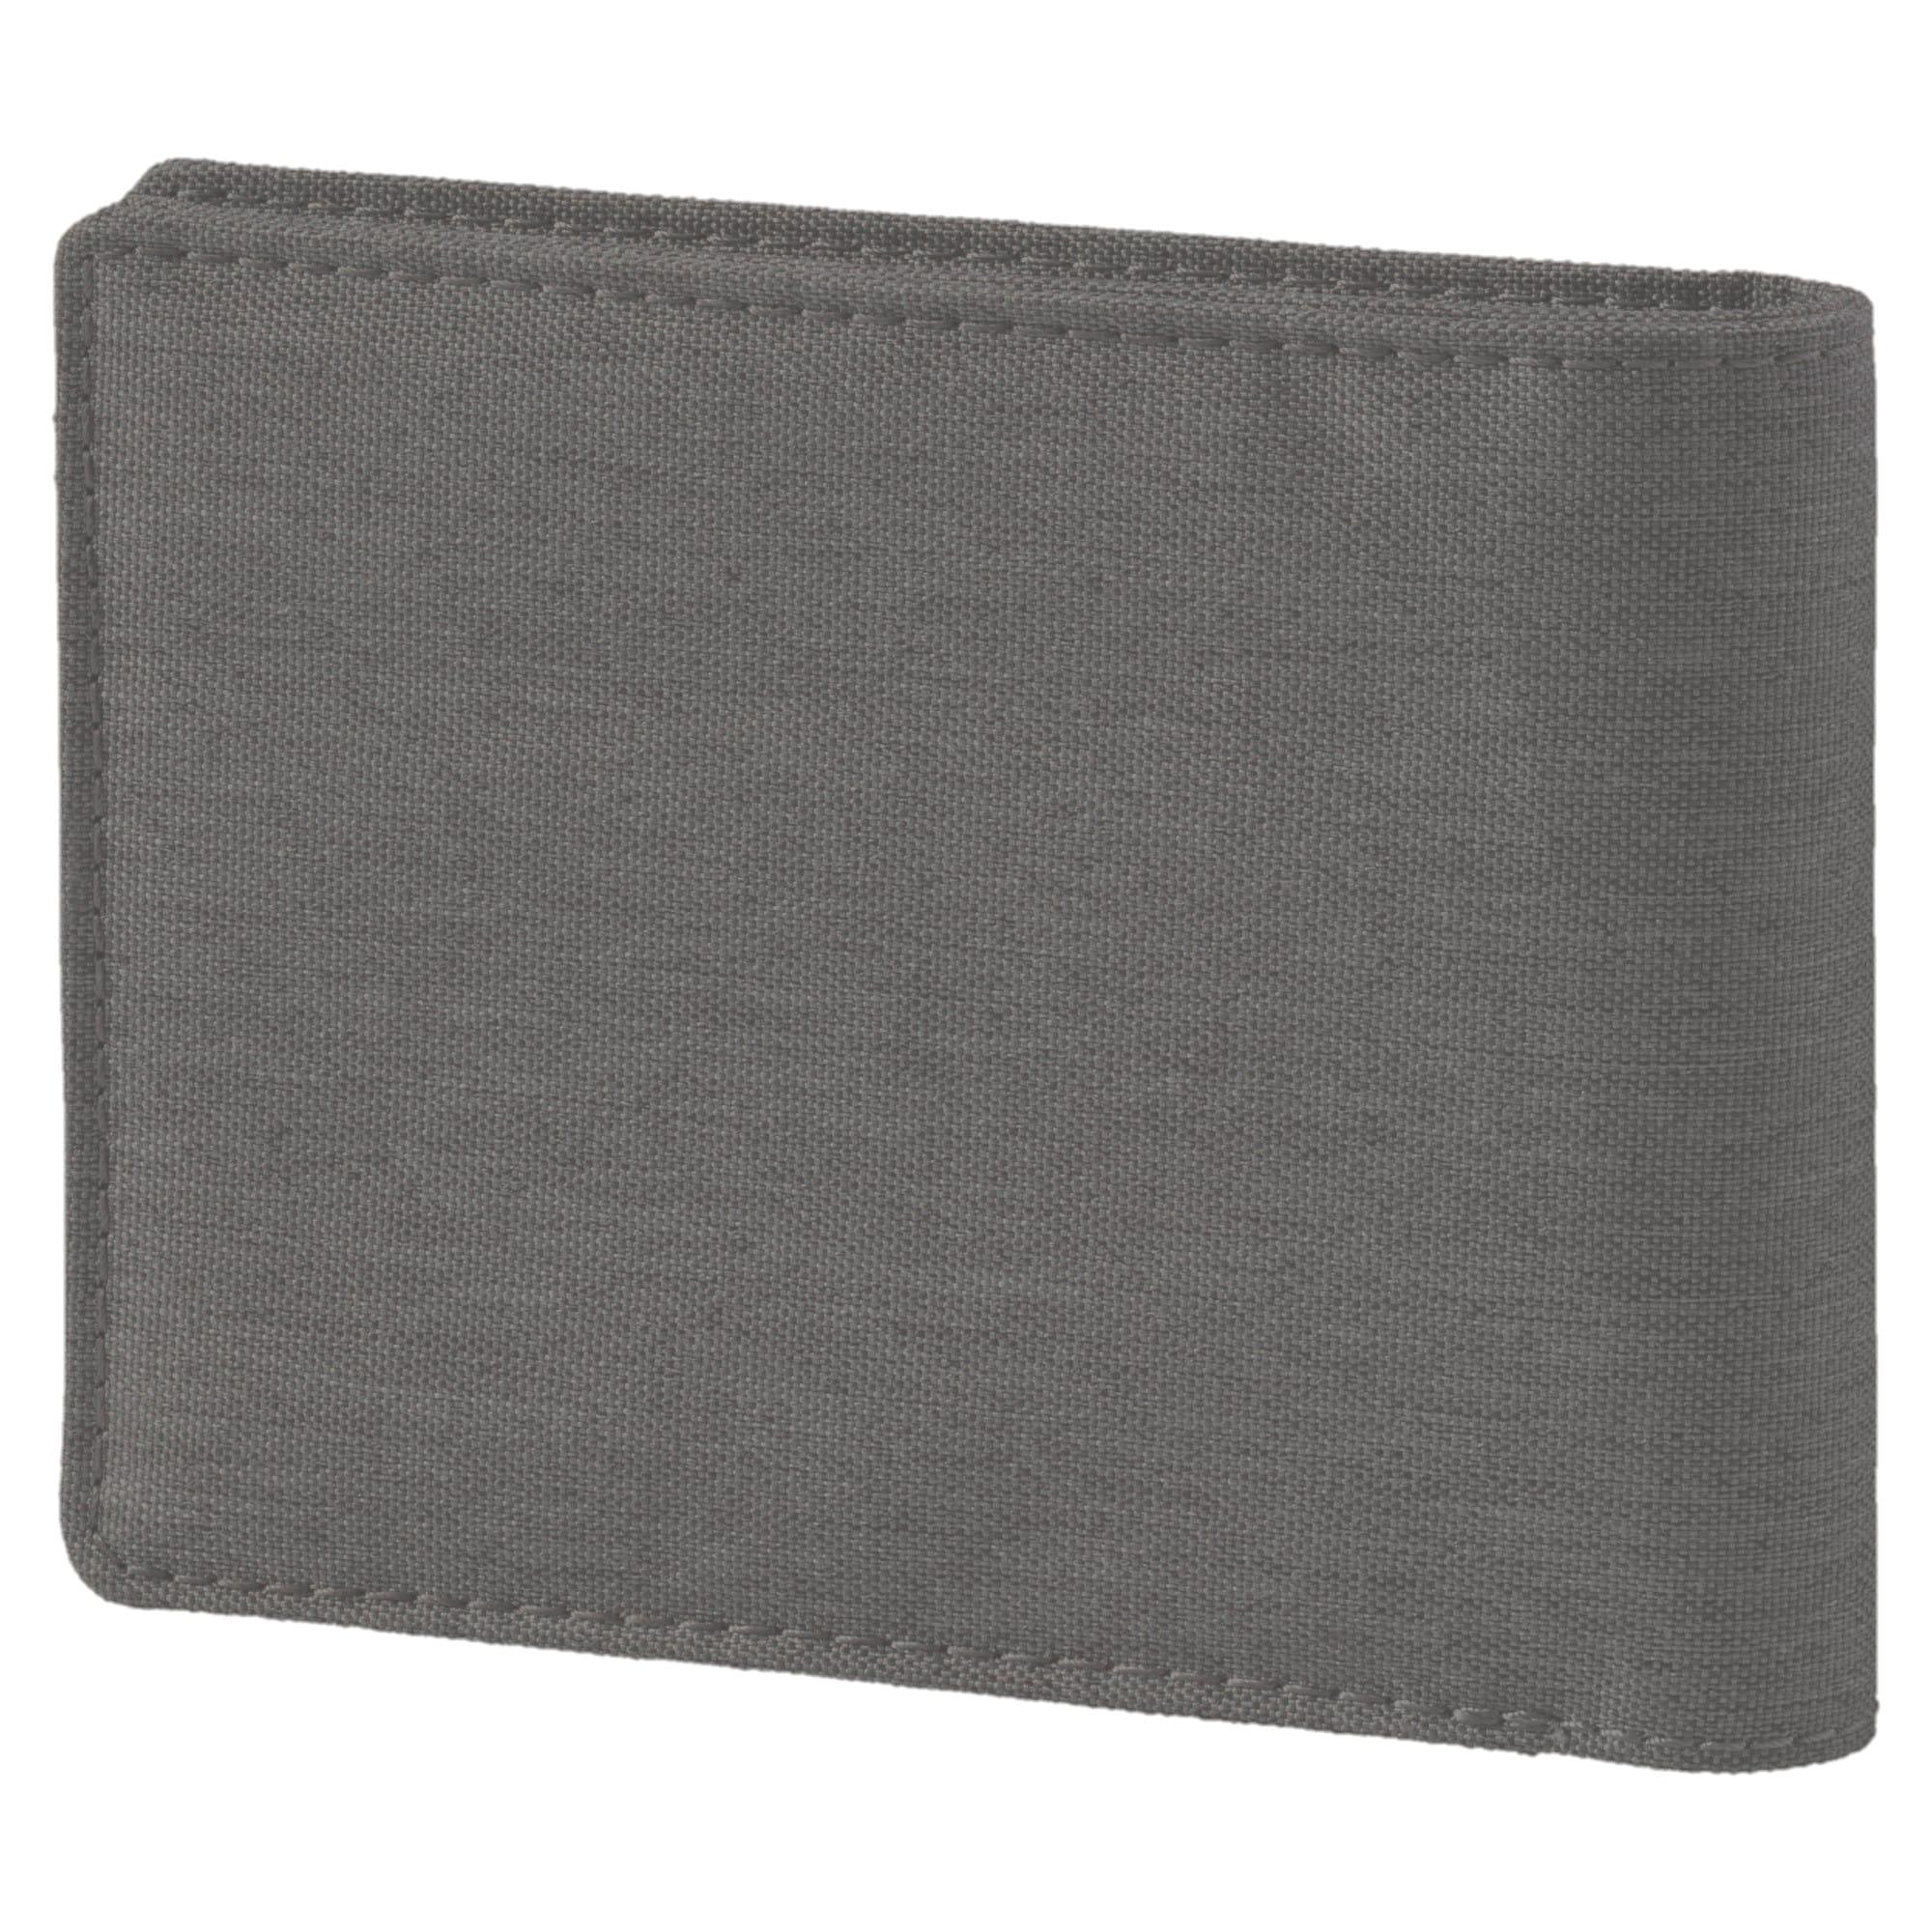 Thumbnail 2 of Scuderia Ferrari Lifestyle Wallet, Charcoal Gray, medium